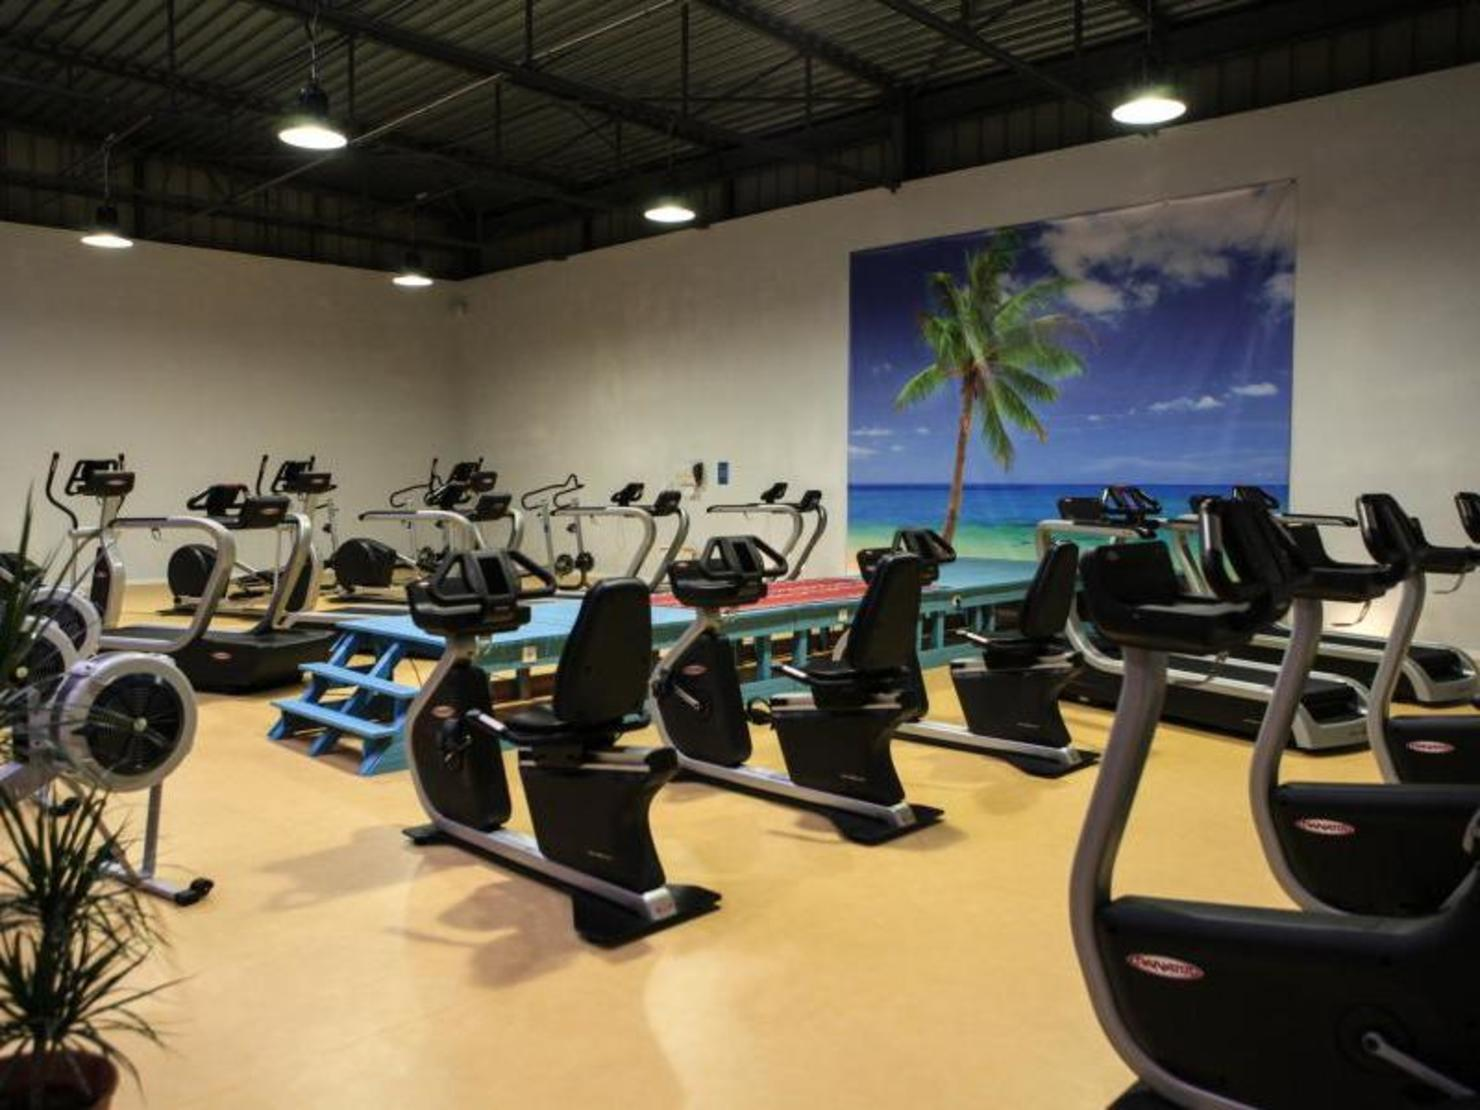 Bodeguita Fitness